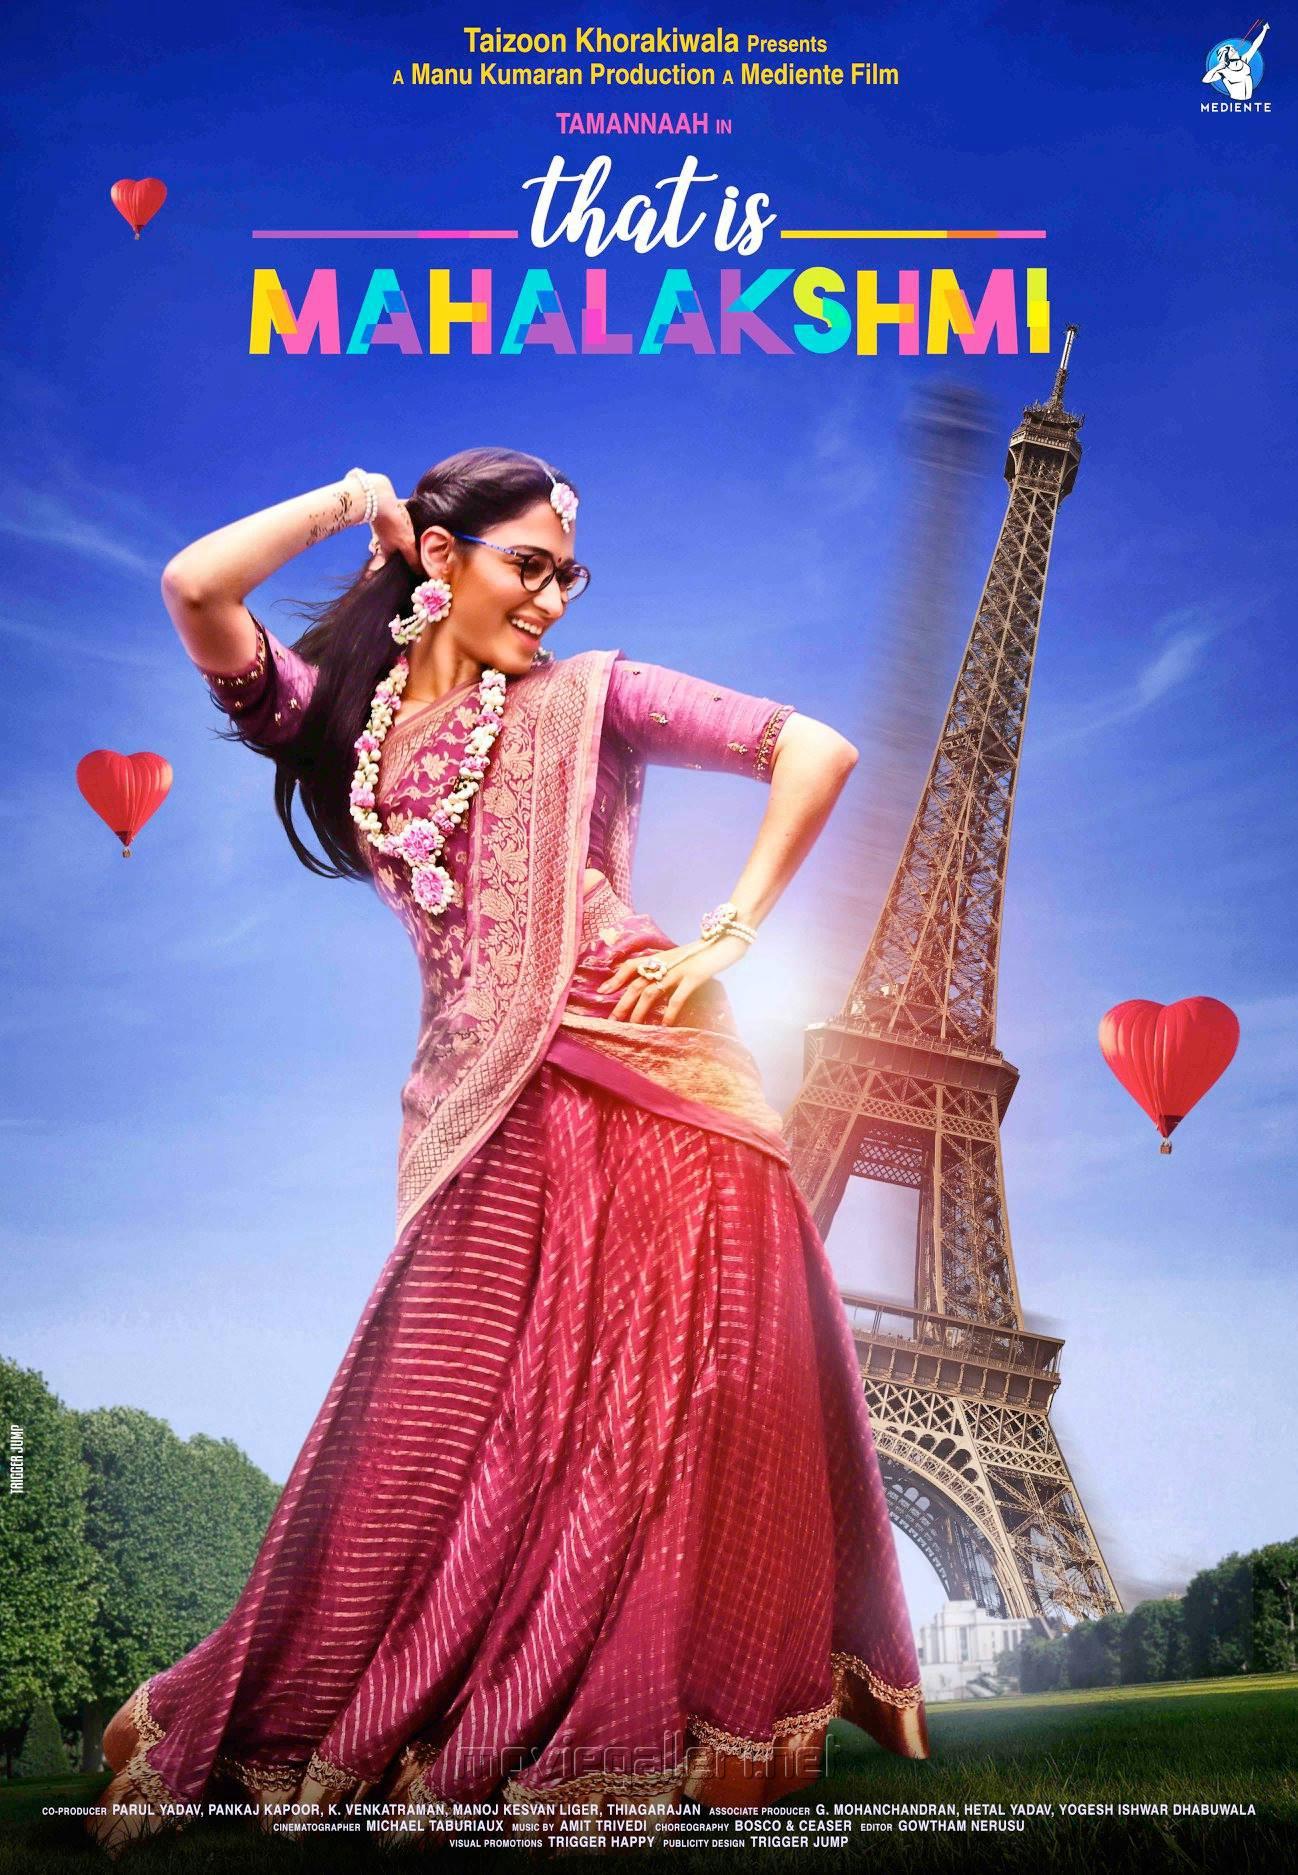 Tamannaah That is Mahalakshmi First Look Posters HD